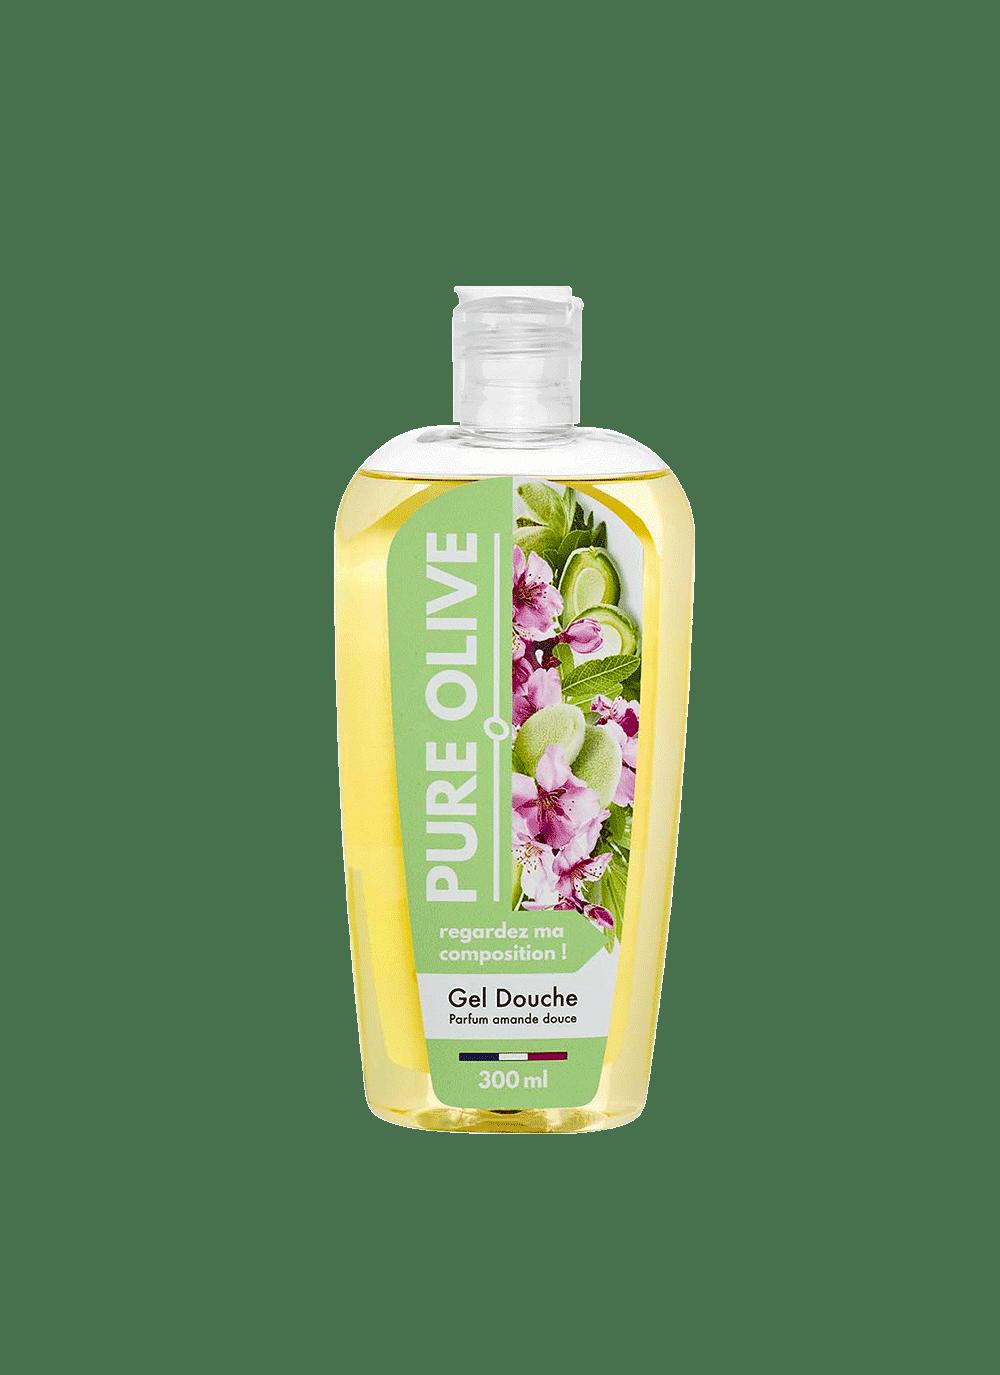 Gel douche Amande Douce, Pure Olive (300 ml)